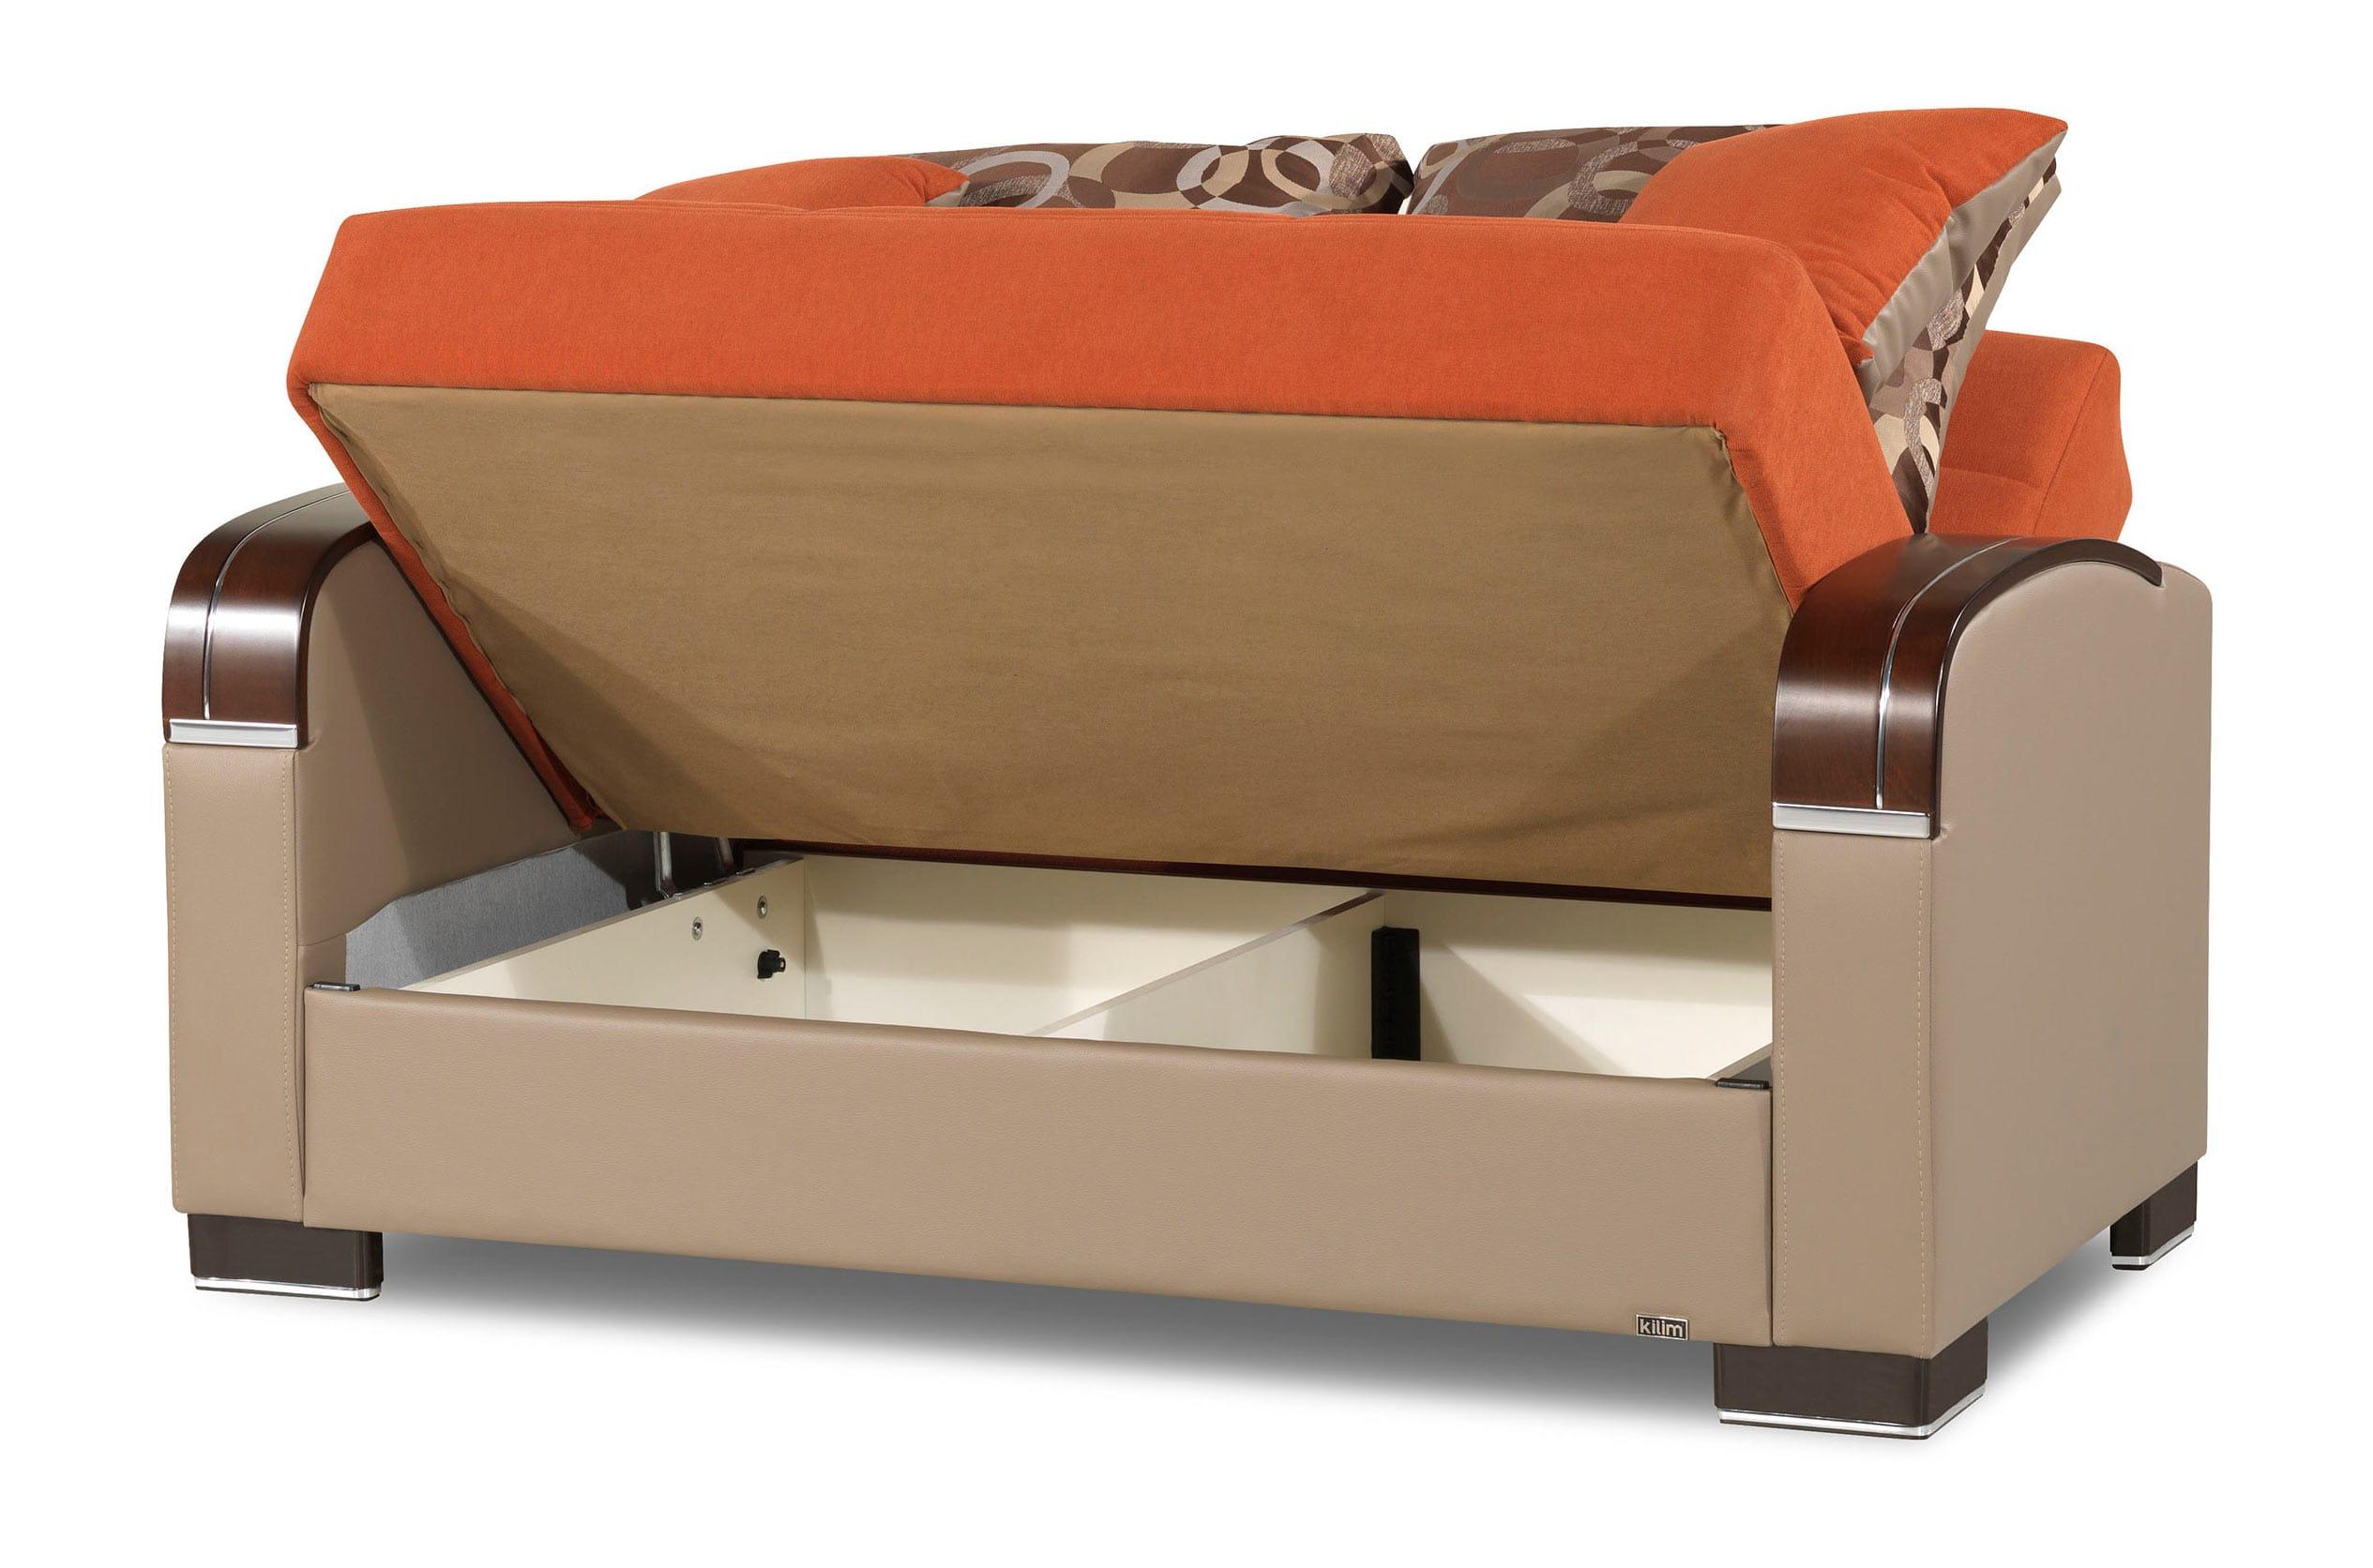 Amazing Mobimax Orange Loveseat By Casamode Inzonedesignstudio Interior Chair Design Inzonedesignstudiocom